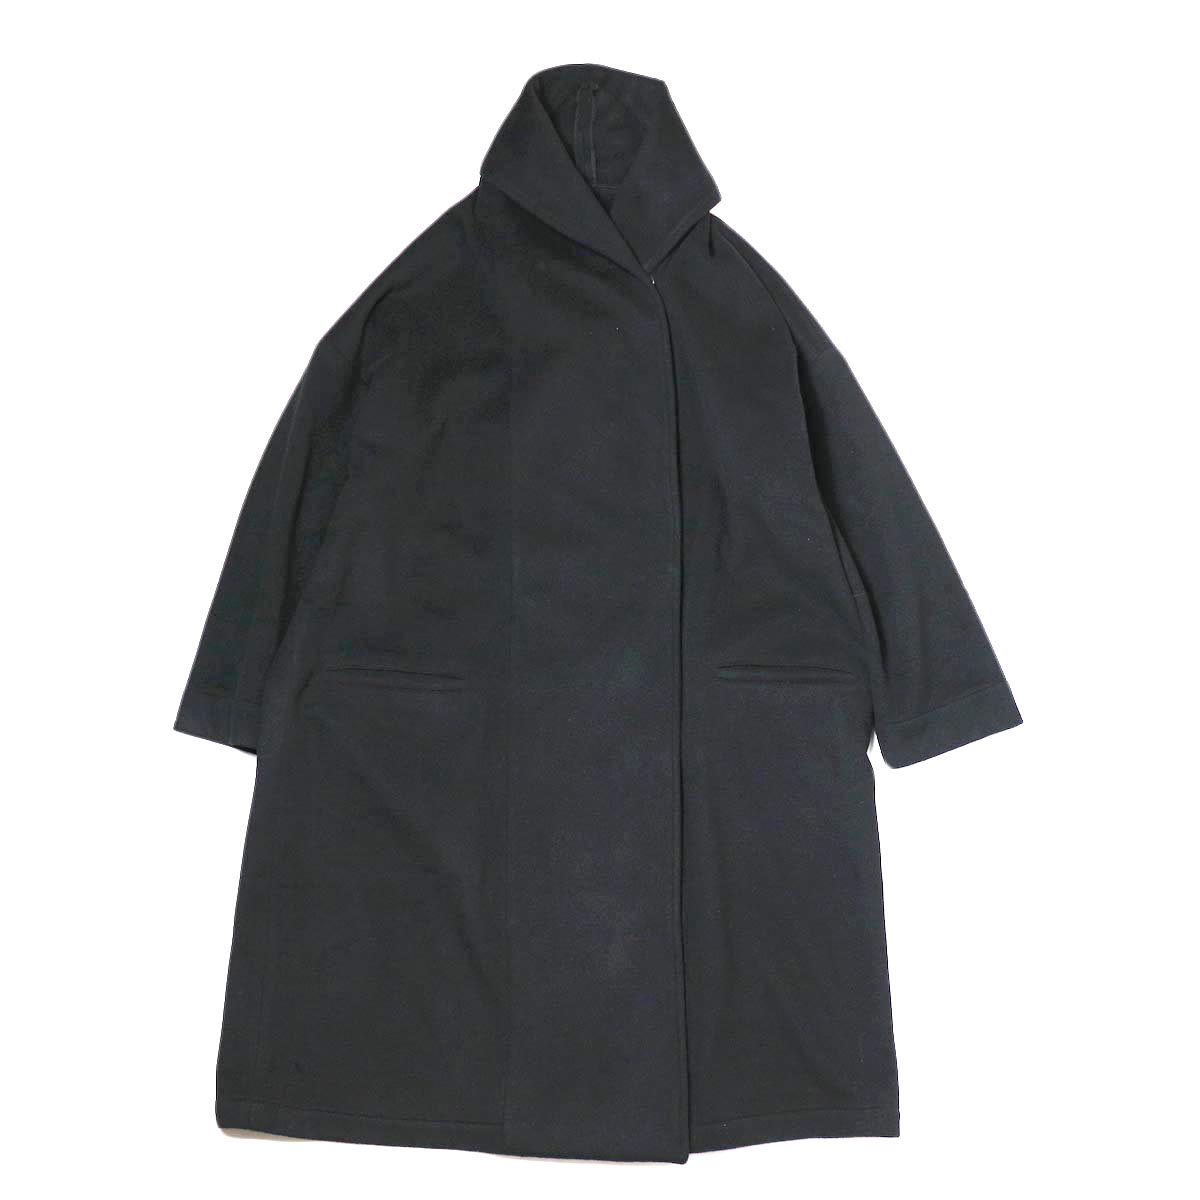 Honnete / Shawl Collar Wide Coat (Black) 正面